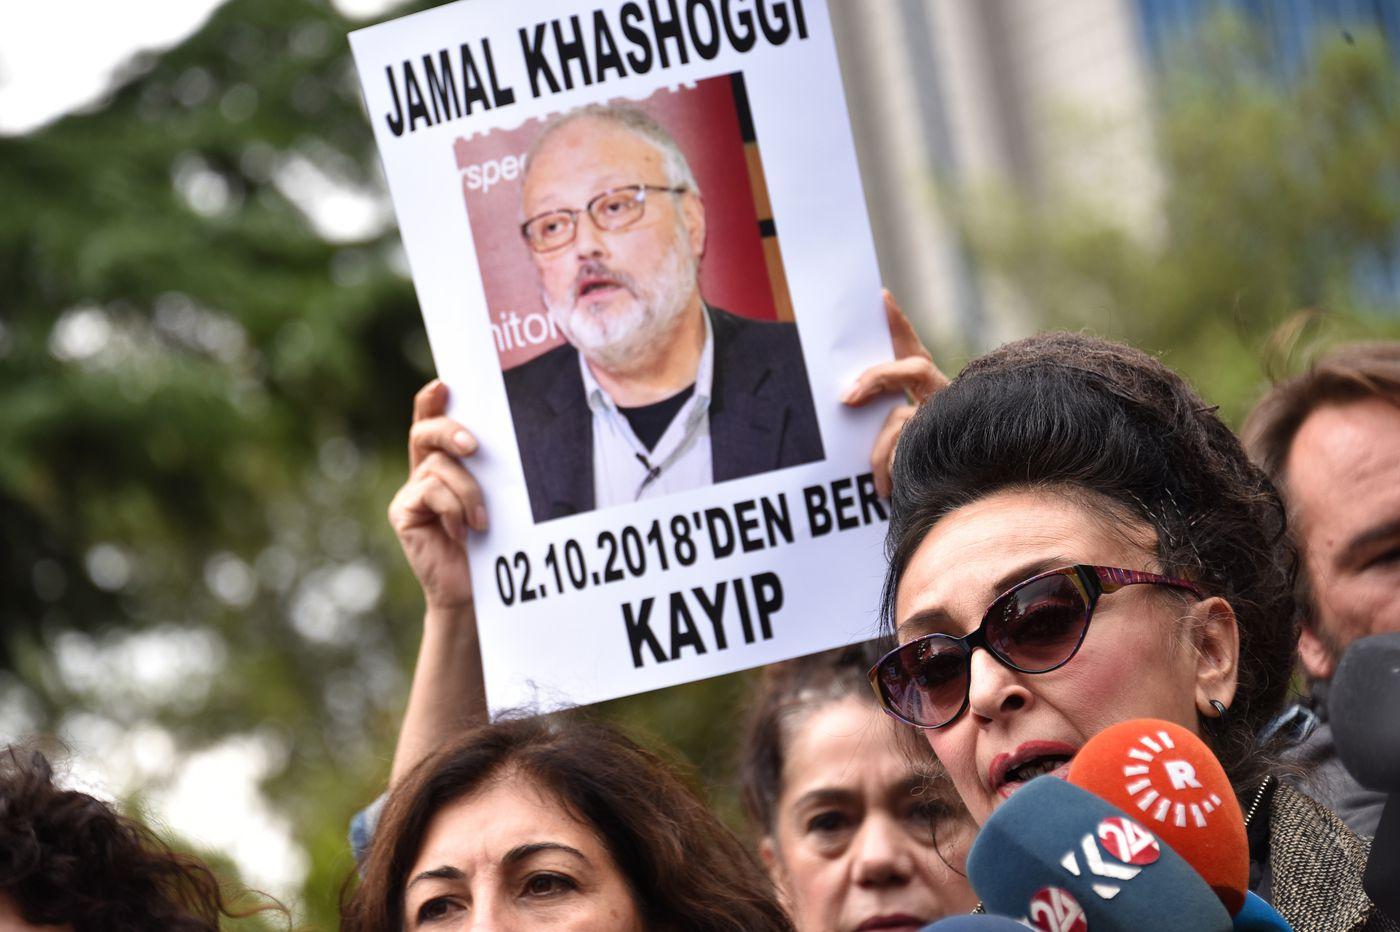 Turkey says it has more evidence to share of Khashoggi killing